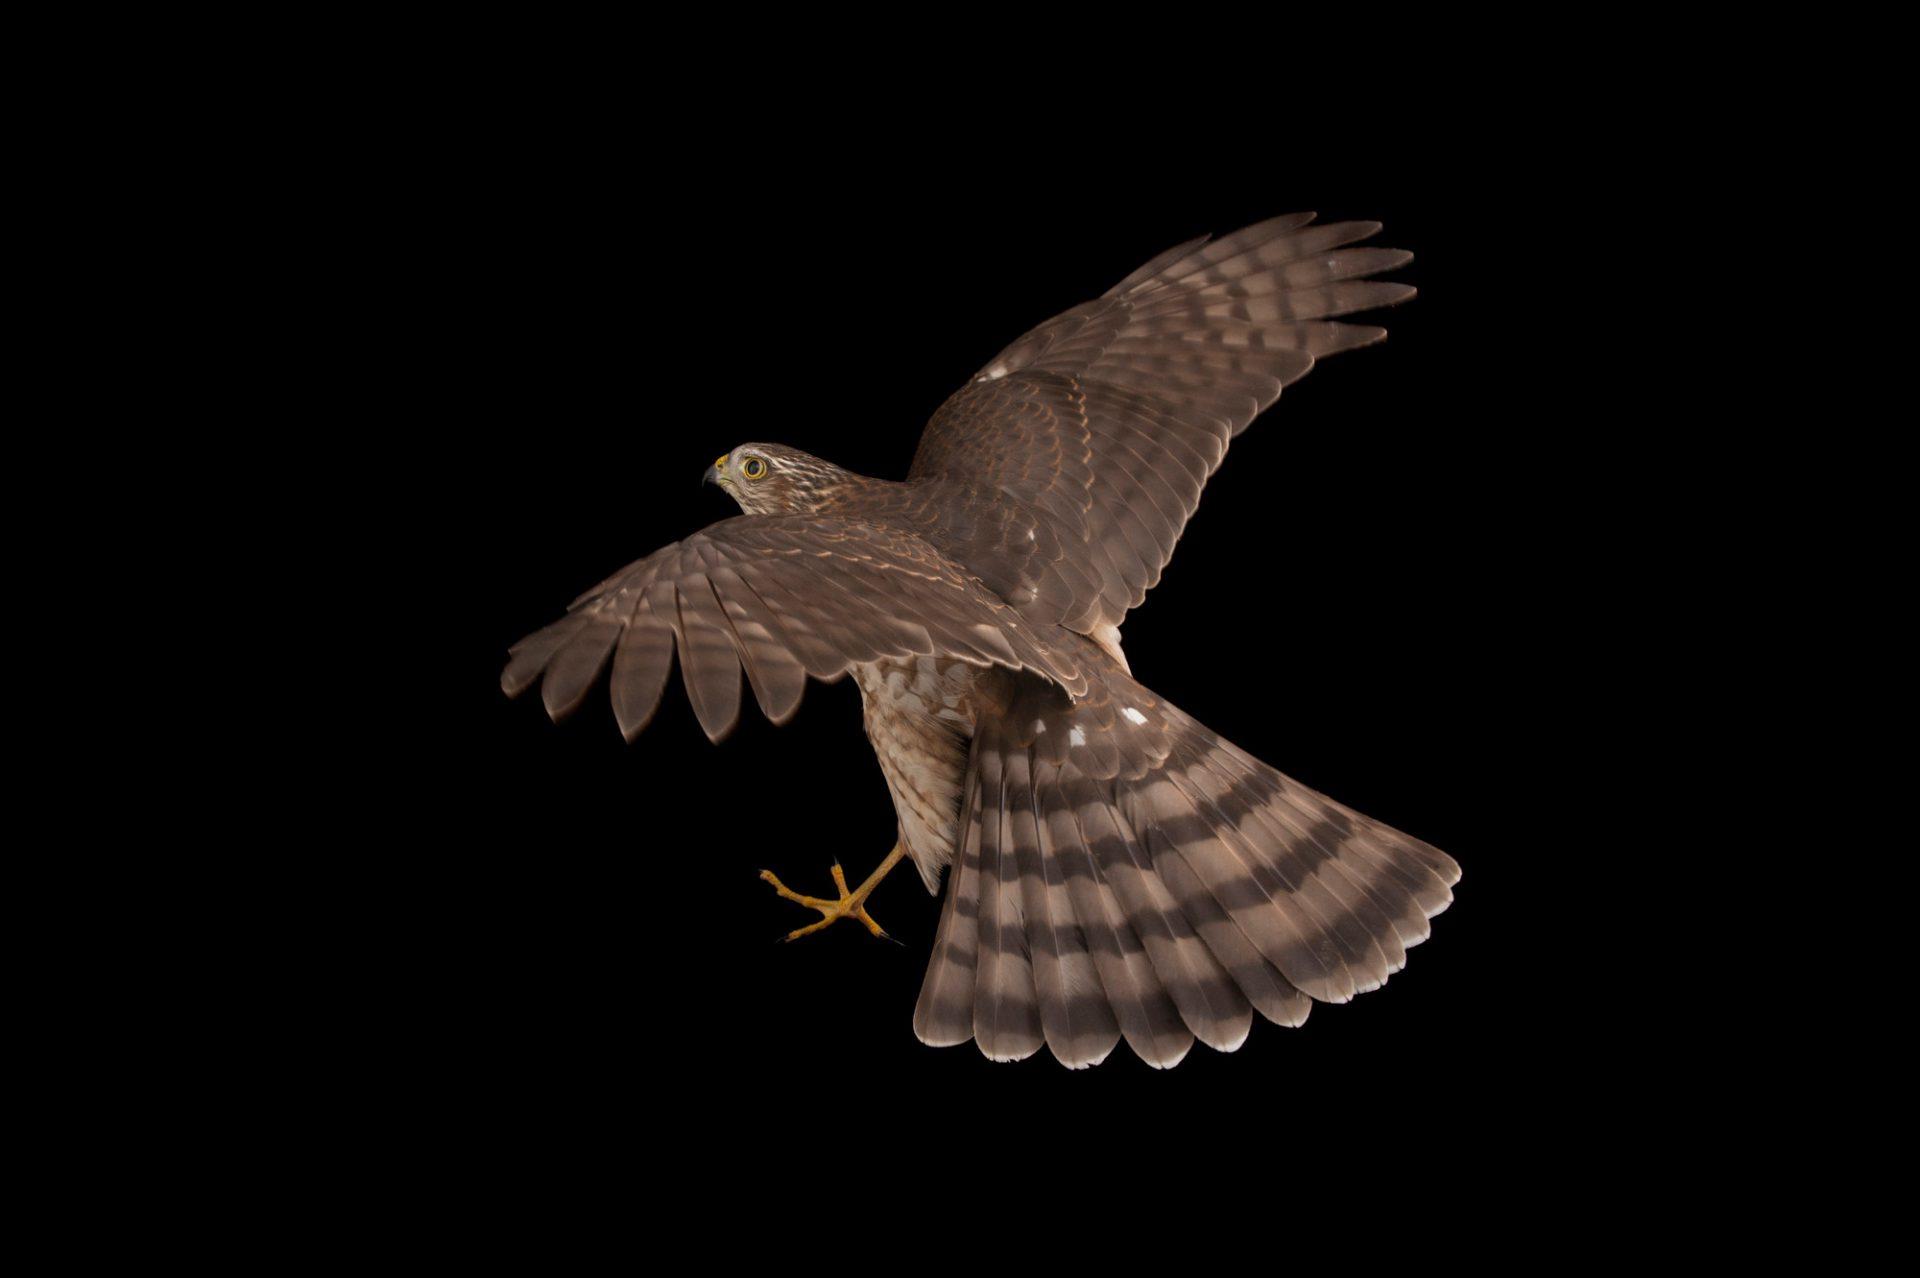 A Sharp-shinned hawk (Accipiter striatus) at Raptor Recovery Nebraka.